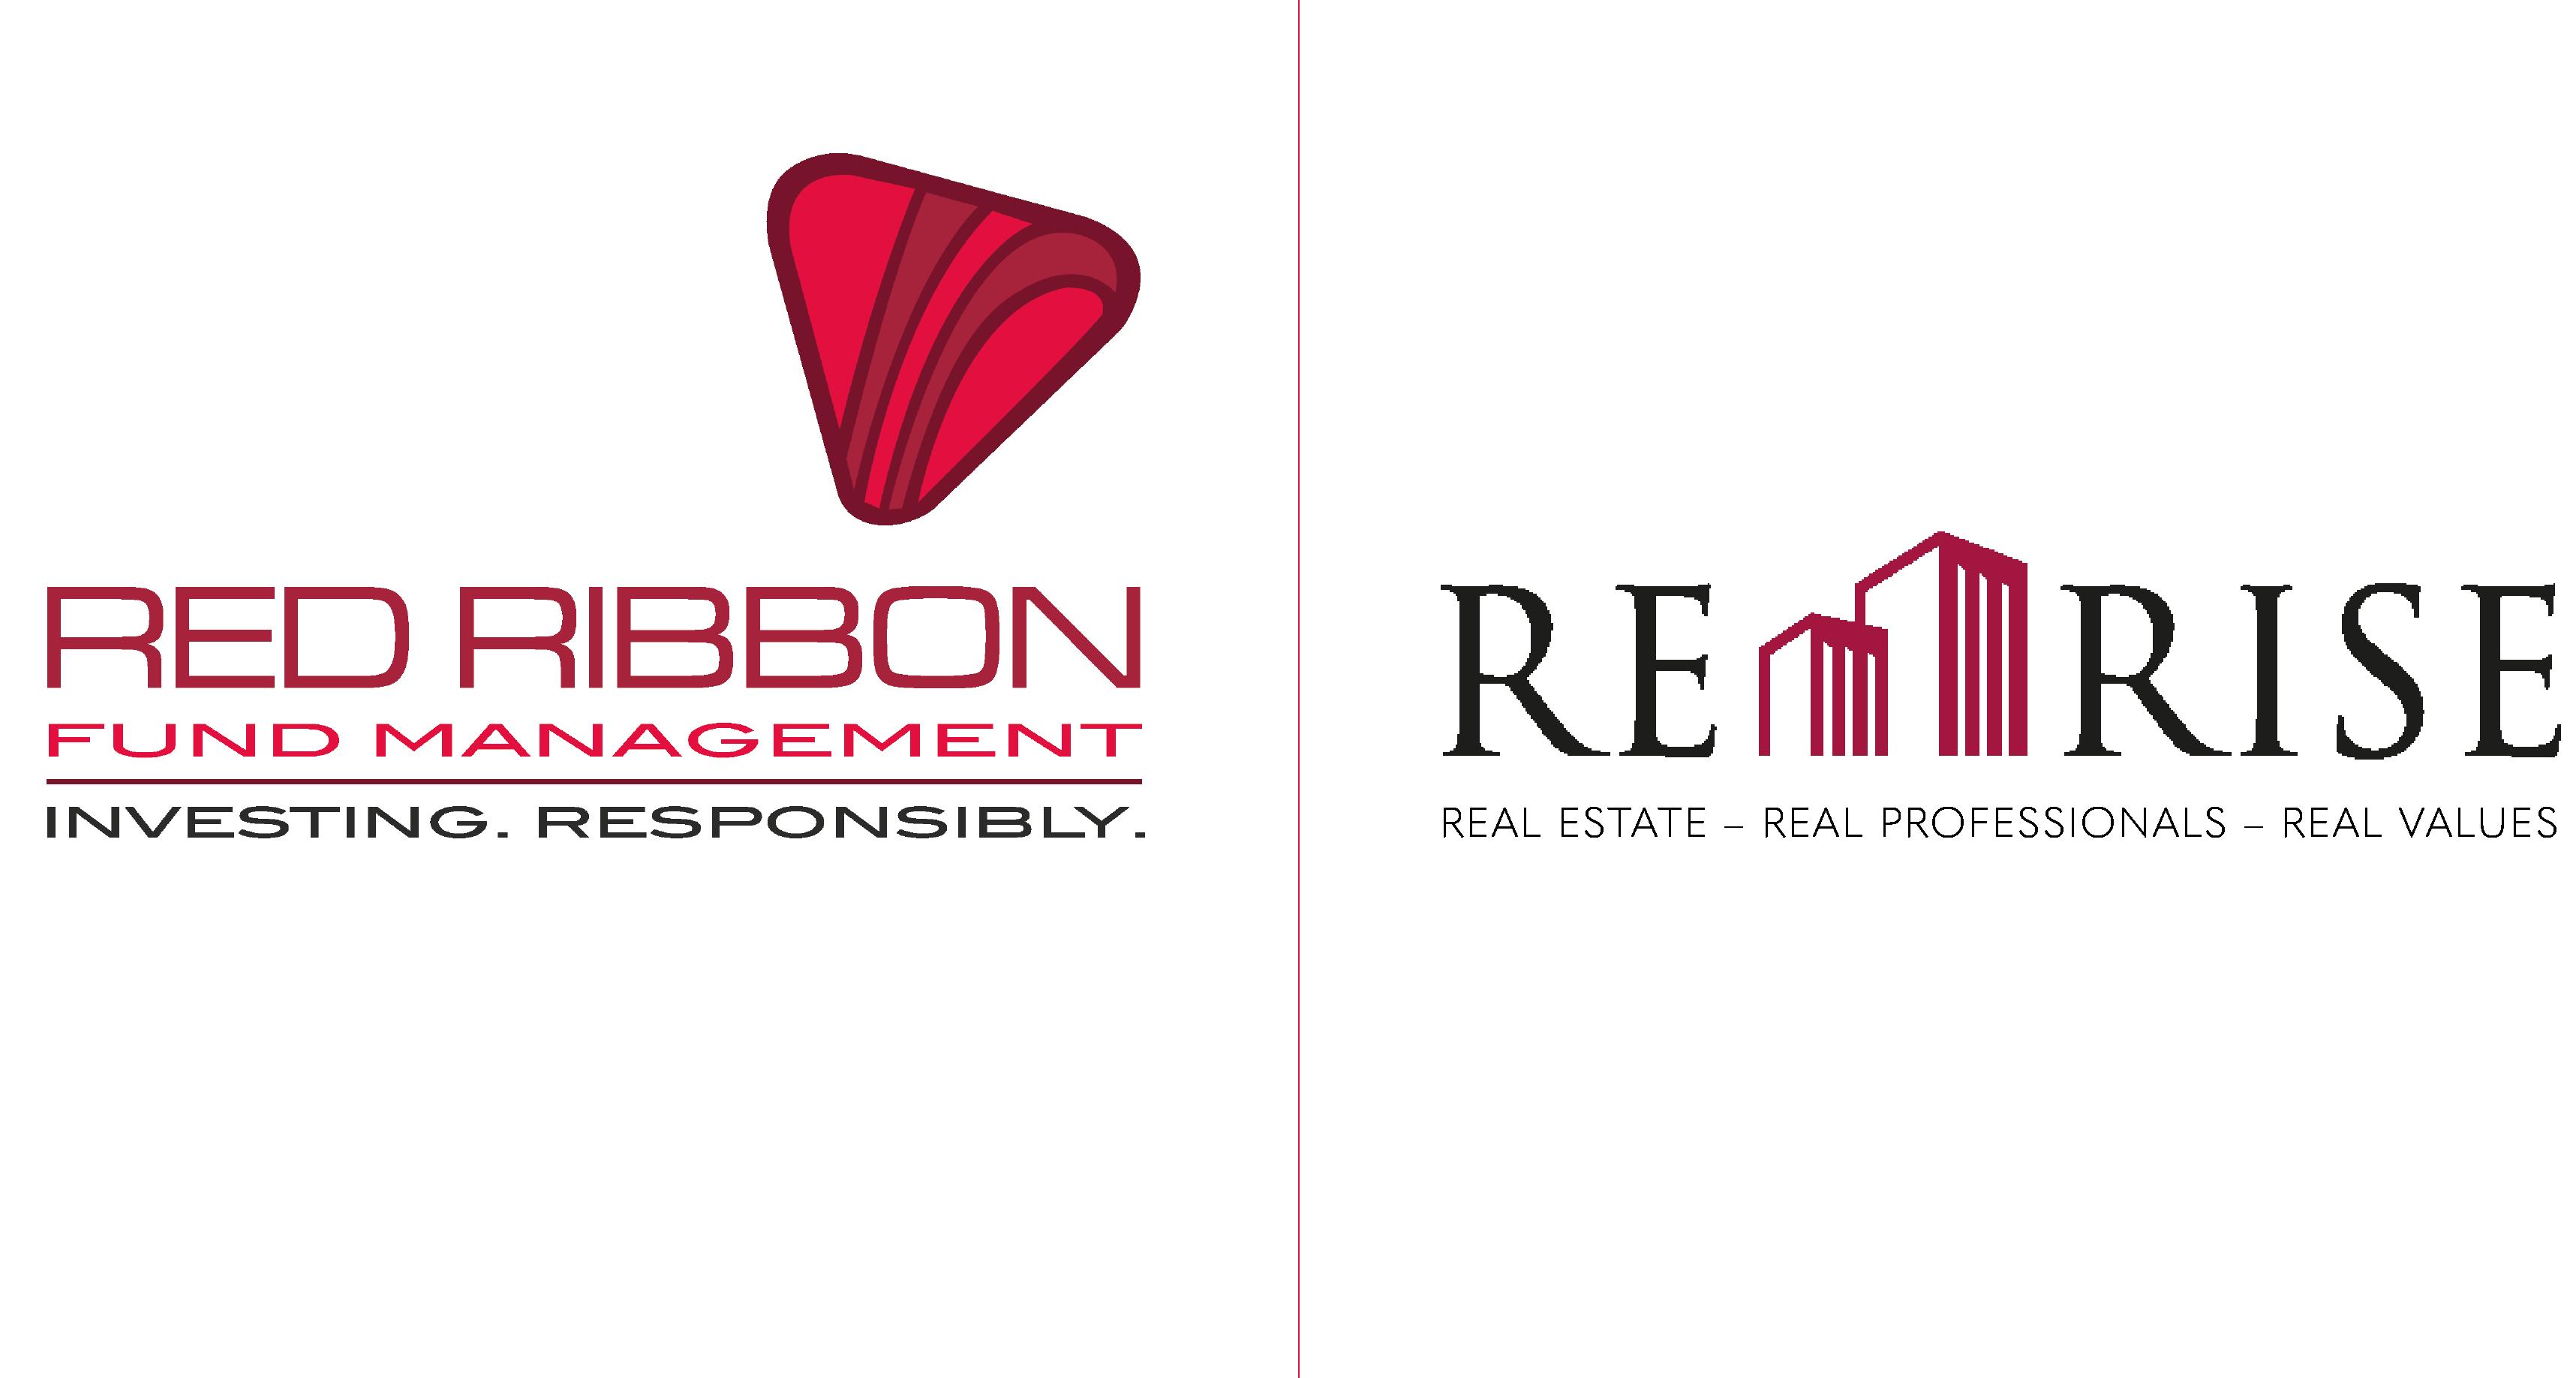 RRRRRE Logo_03.09.2021